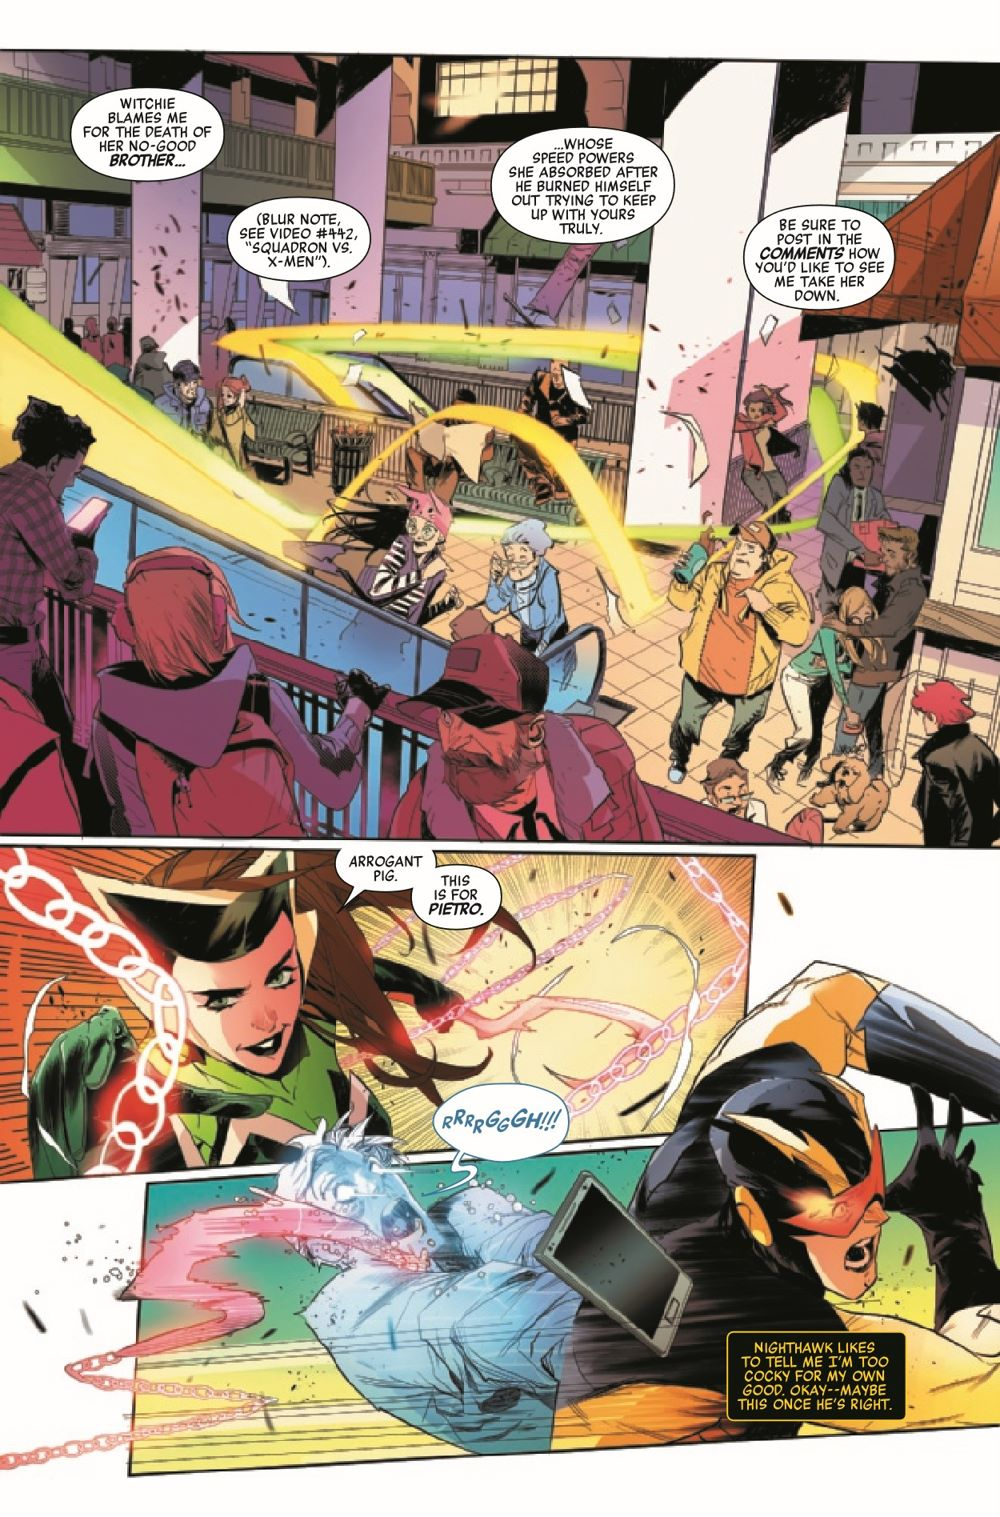 HEROESREBORN2021003_Preview-5 ComicList Previews: HEROES REBORN #3 (OF 7)